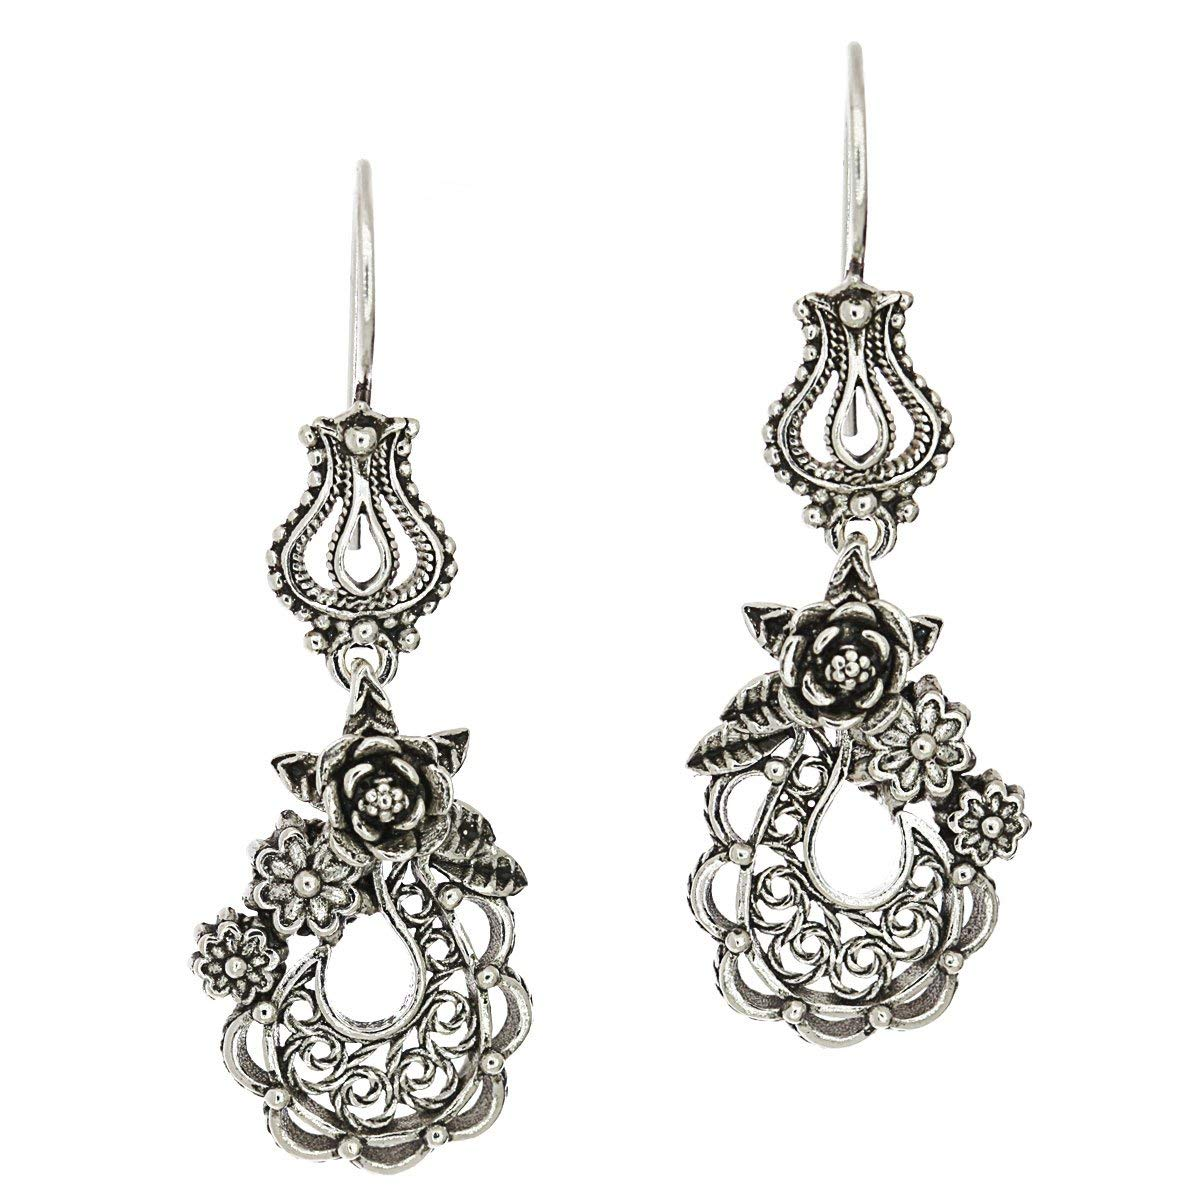 1853cffcb Cheap Silver Filigree Flower Earrings, find Silver Filigree Flower ...